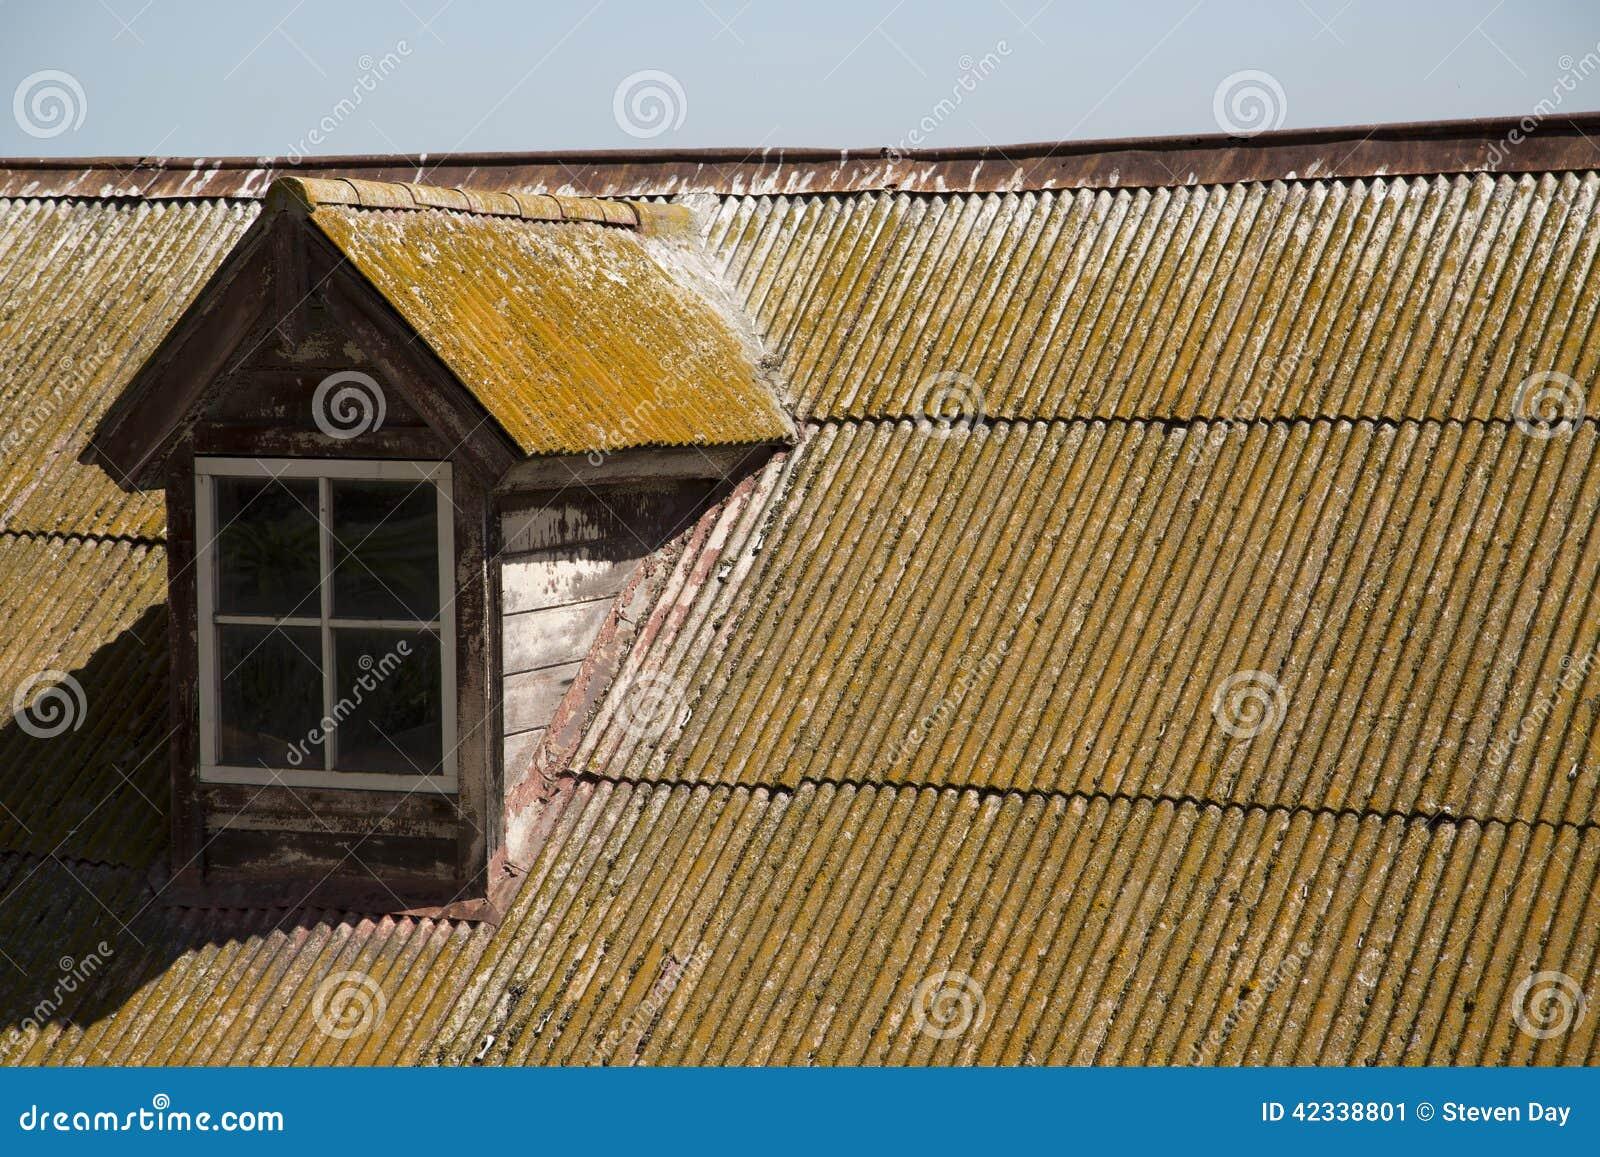 royaltyfree stock photo download old corrugated metal roof